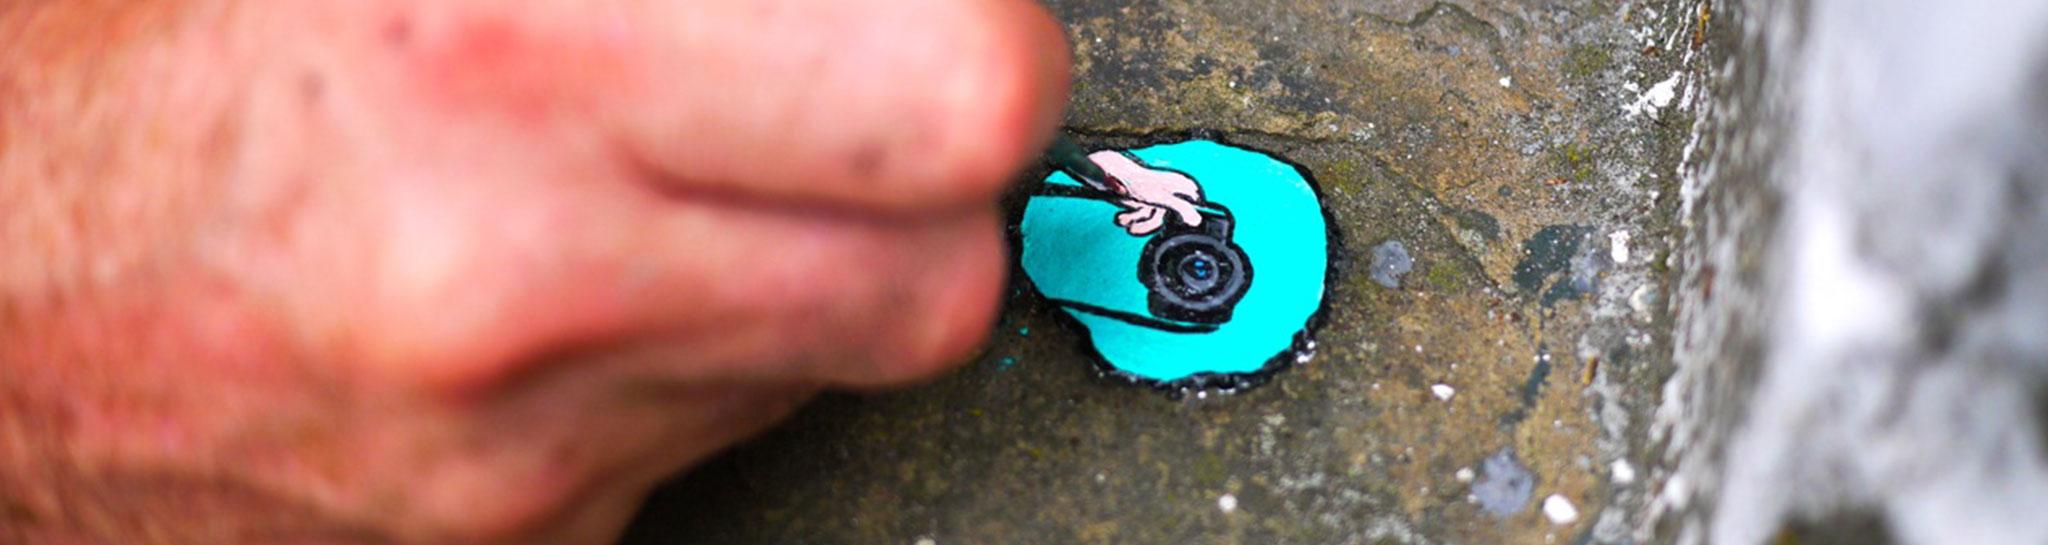 "Ben Wilson: Turning ""ABC"" Gum into ART"